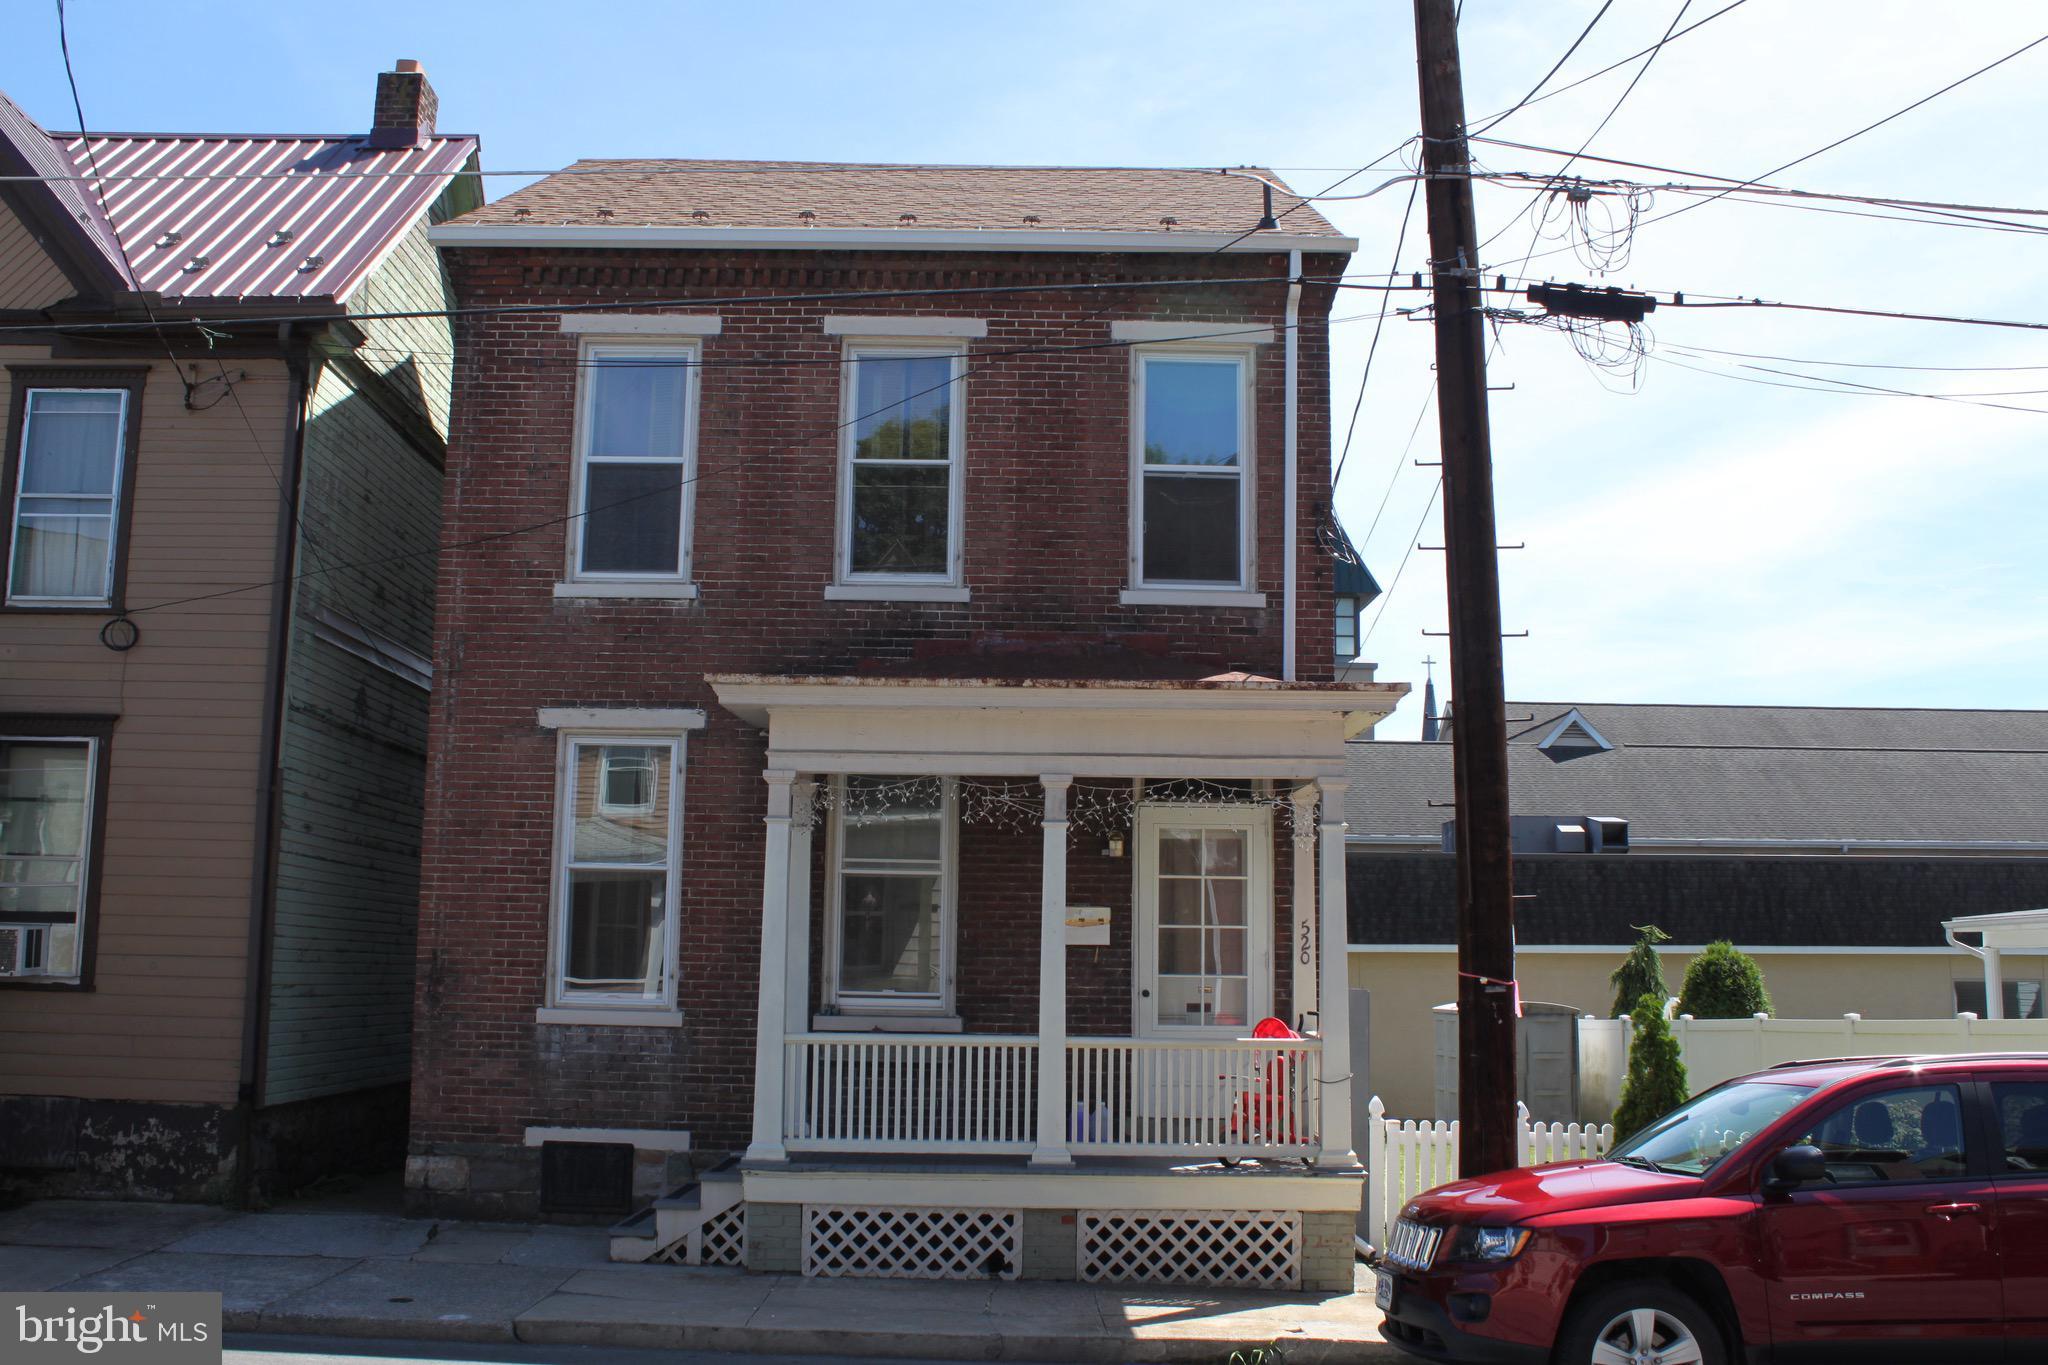 520 CHURCH STREET, HUNTINGDON, PA 16652